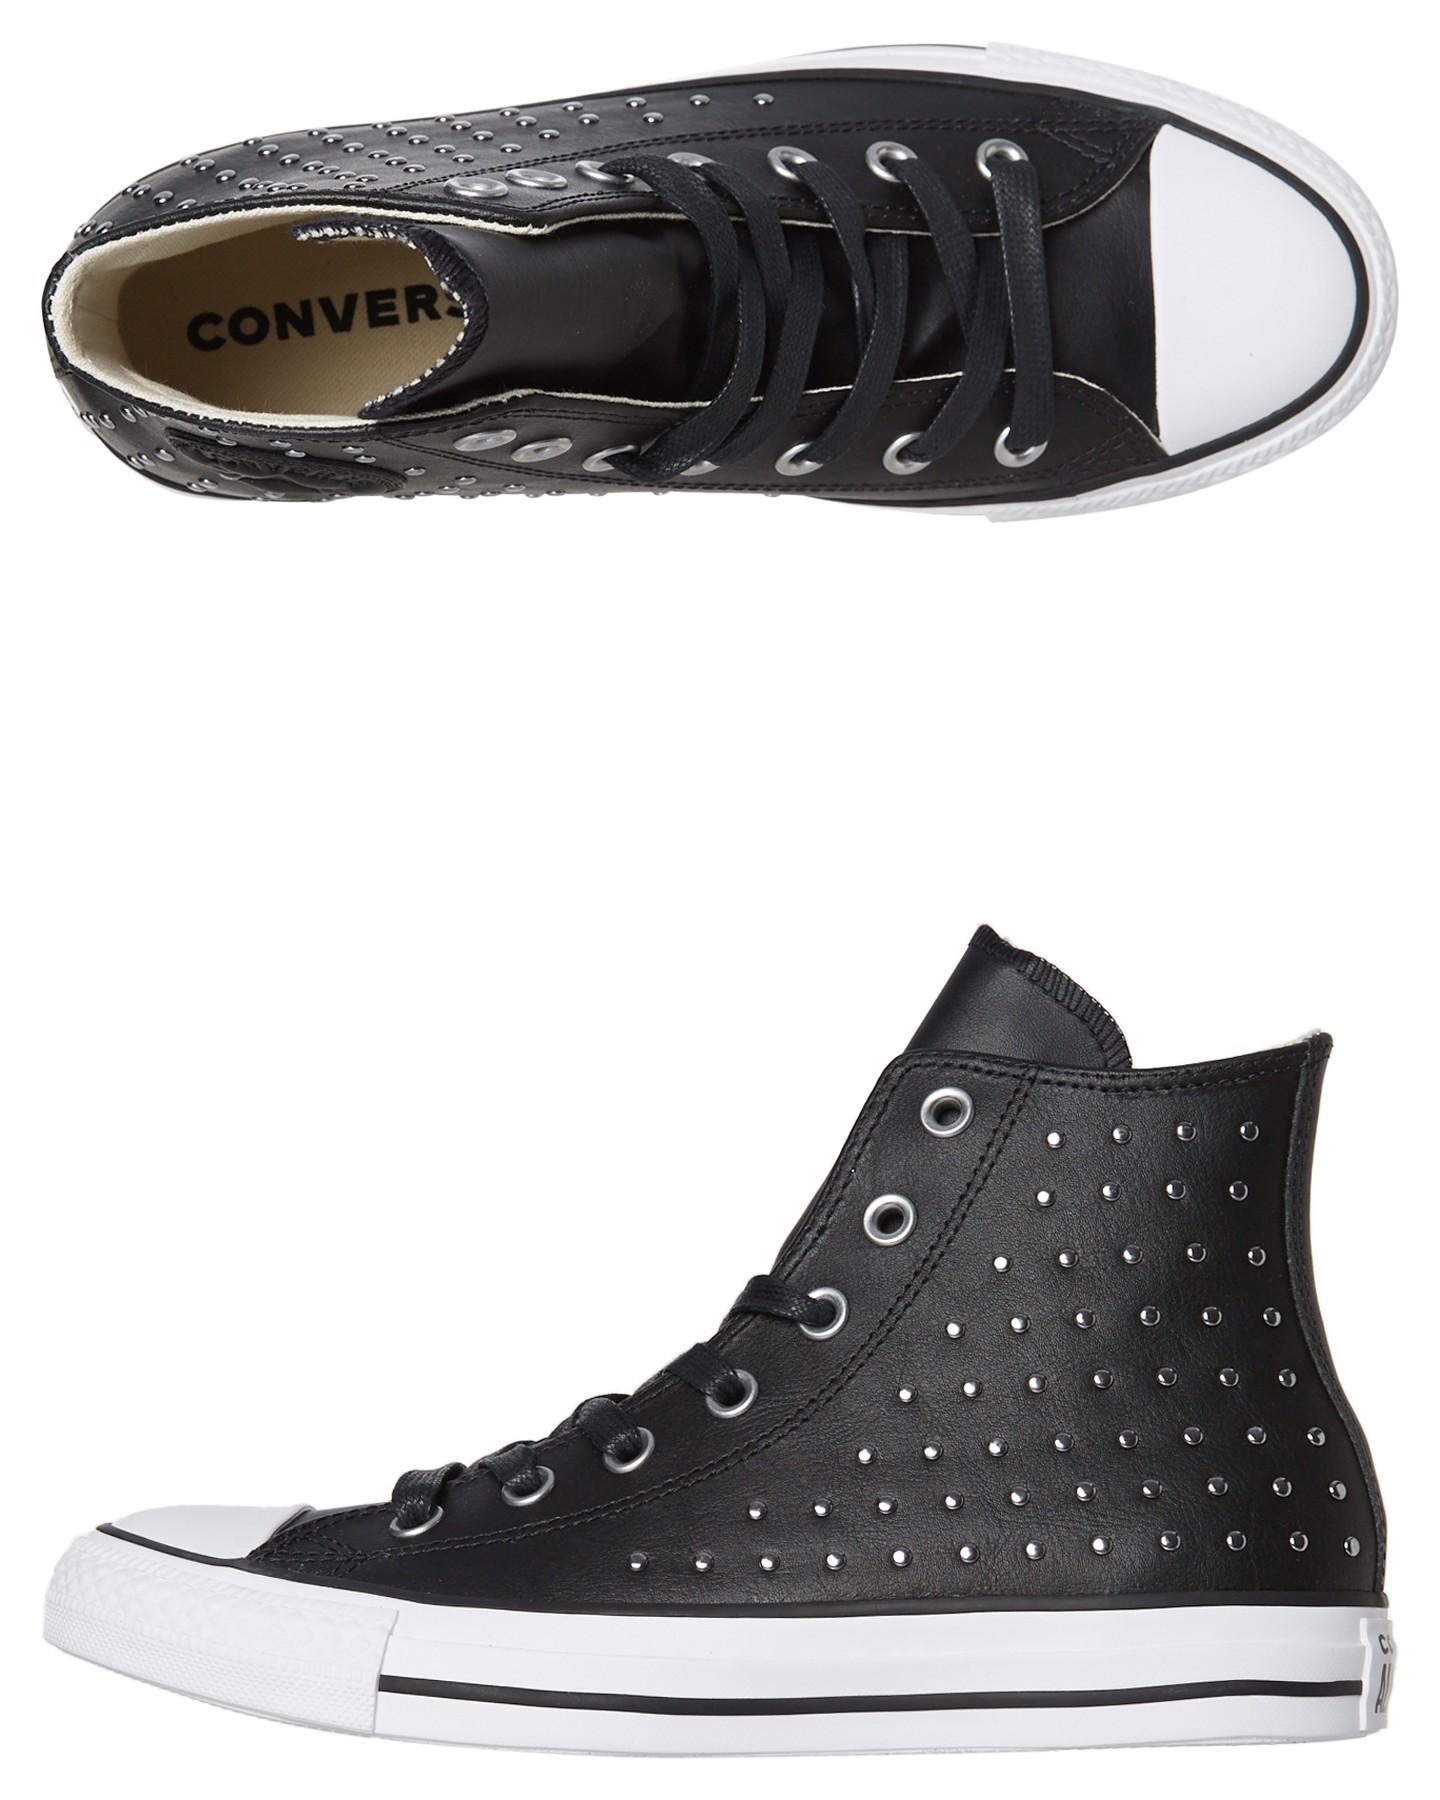 3a4e6a773866 Black Coloured Chuck Taylor All Star Leather Stud Hi Shoe Black By CONVERSE  | ShoeSales